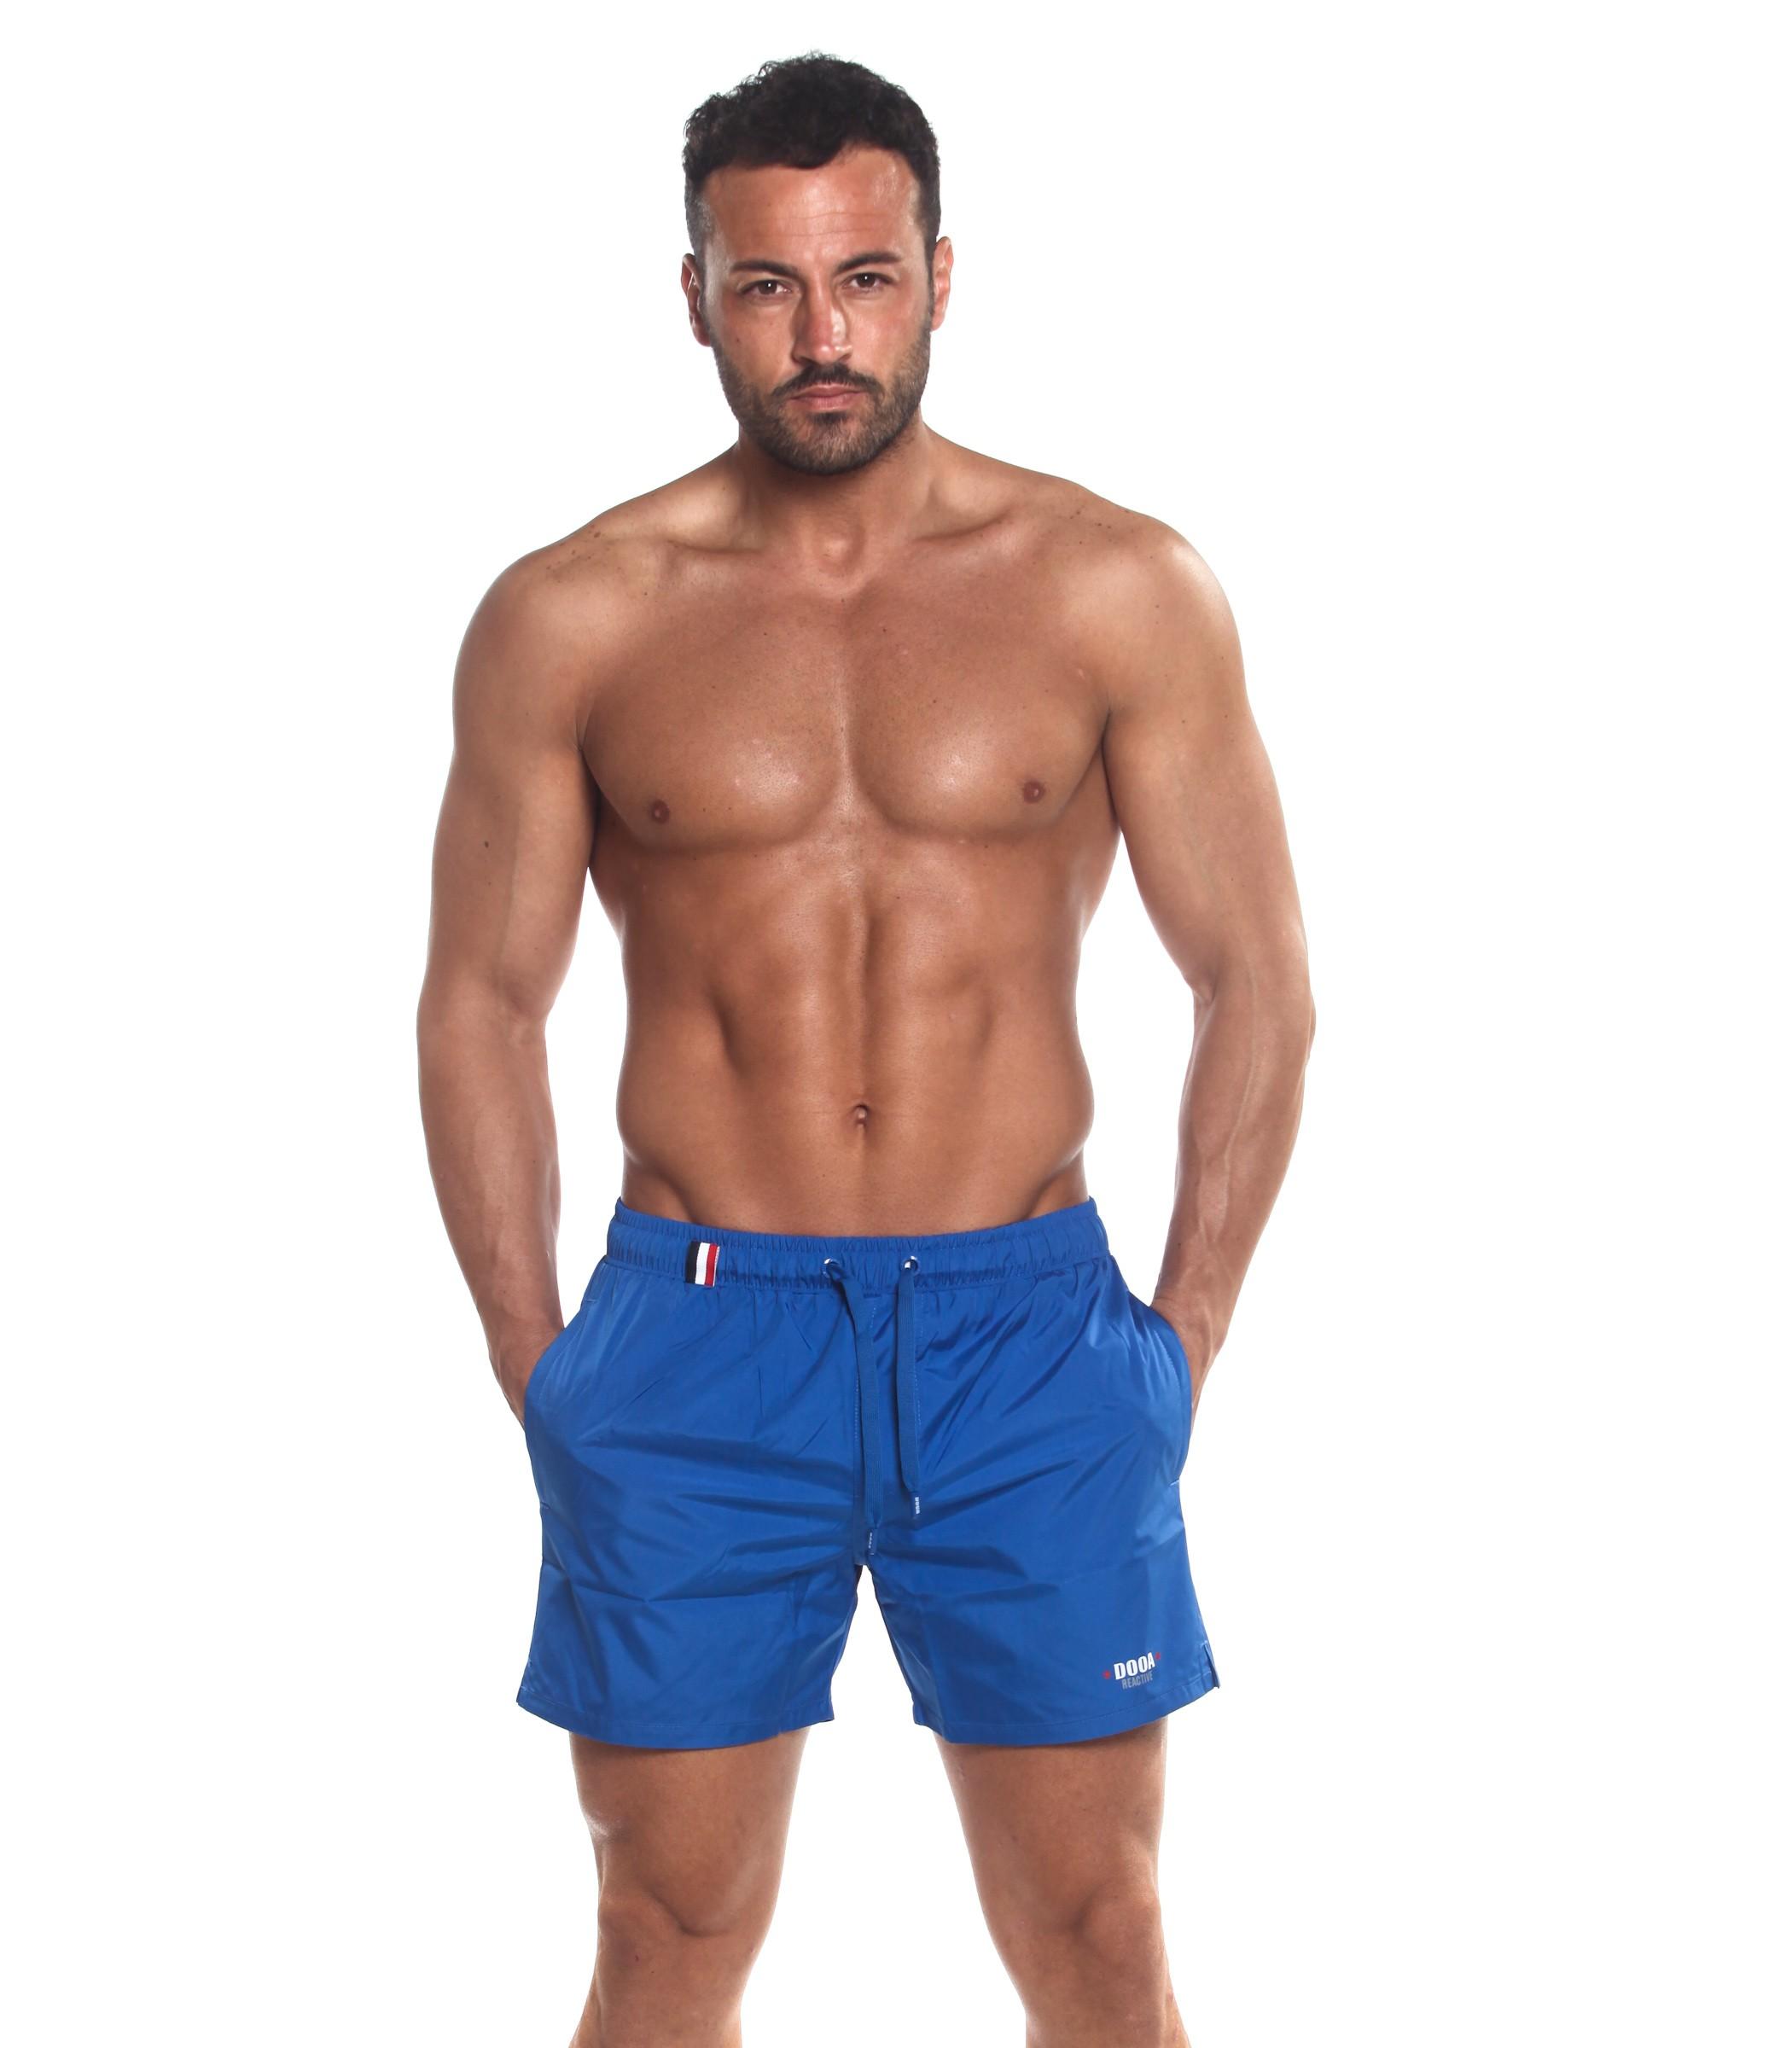 timeless design c29fb a3b02 Costume da bagno DOOA shorts pantaloncino con laccio da uomo ...